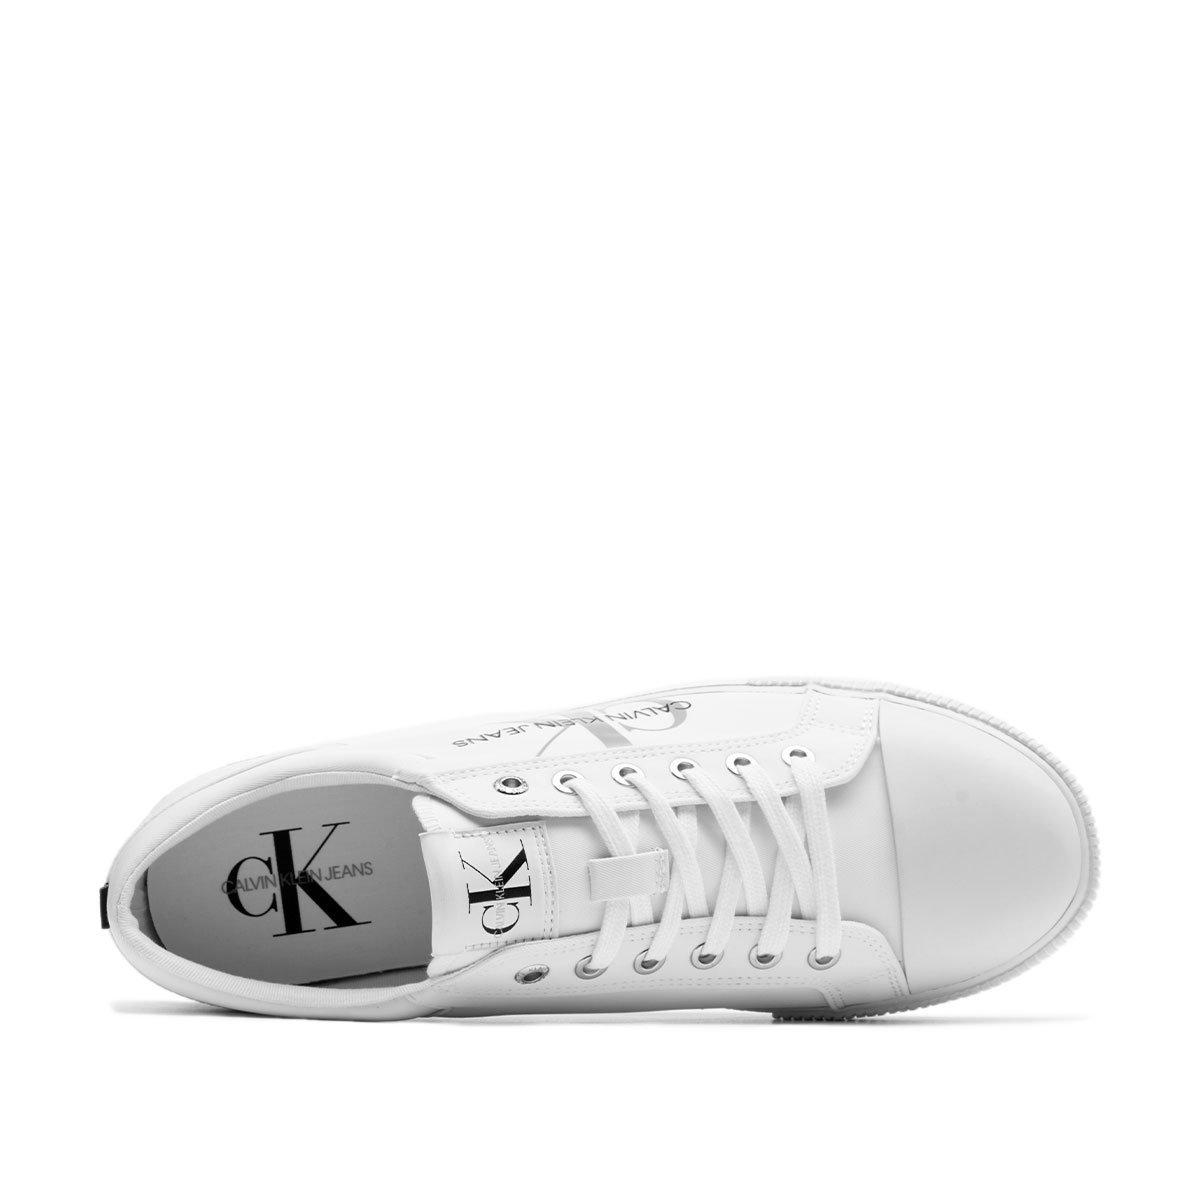 Calvin Klein Vulcanized Sneaker Lace Up